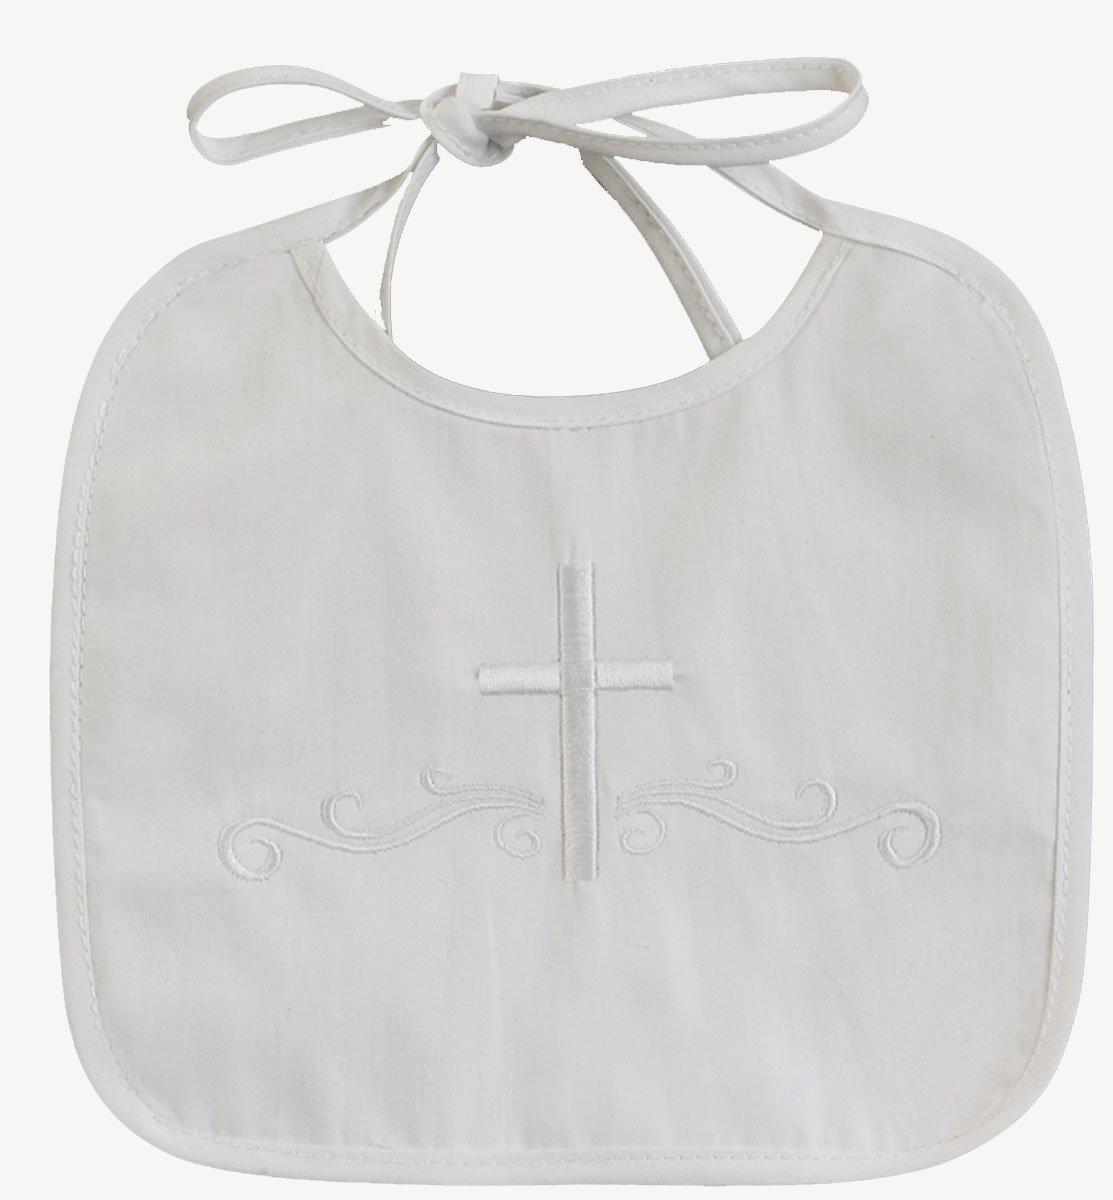 Lito White Embroidered Cotton Christening Baptism Boy's Bib, one size